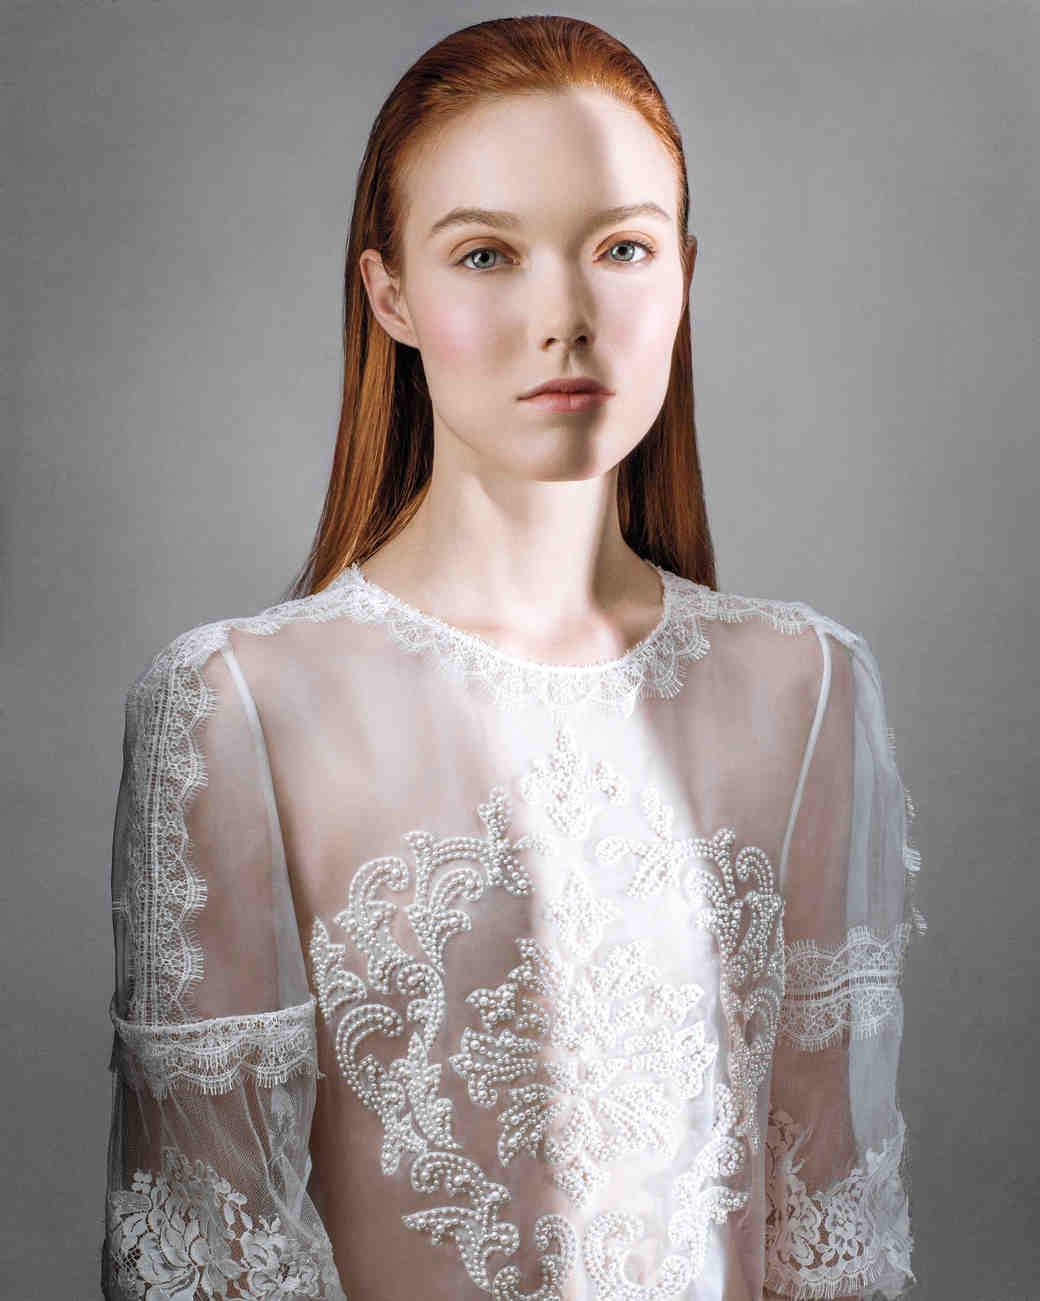 fashion-img-04-d112353.jpg